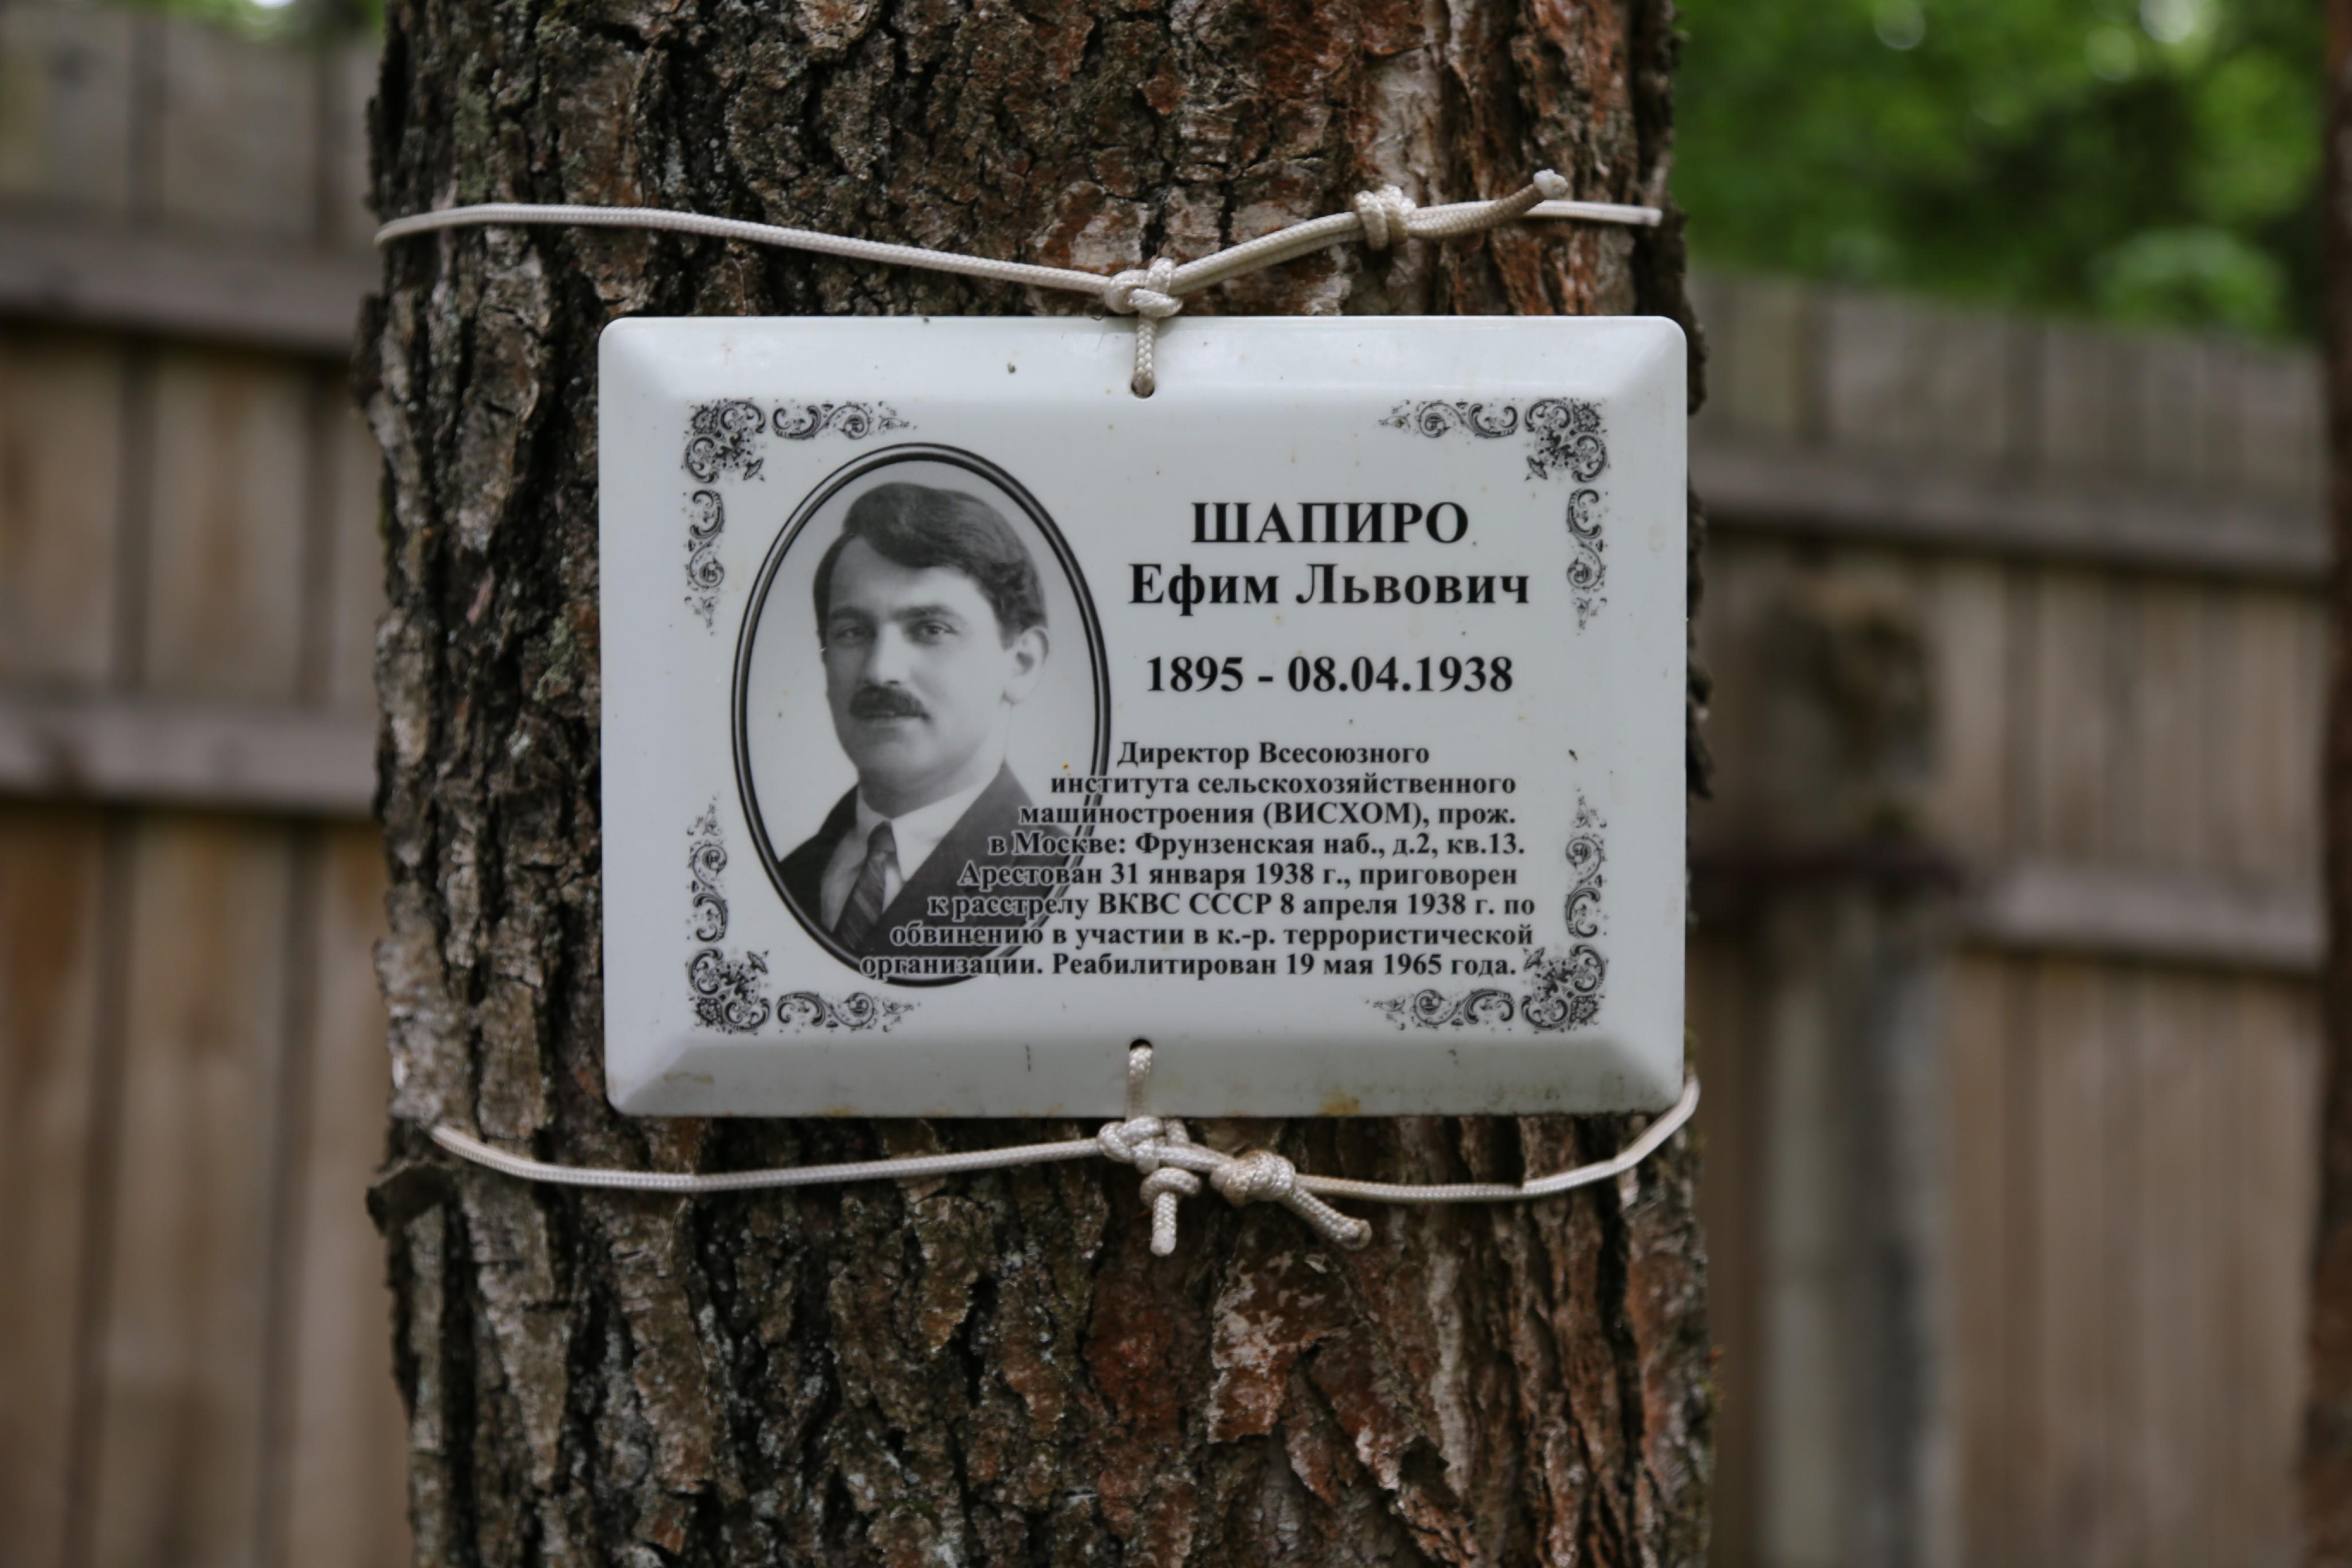 Памятная табличка Е.Л. Шапиро. Фото 07.06.2018